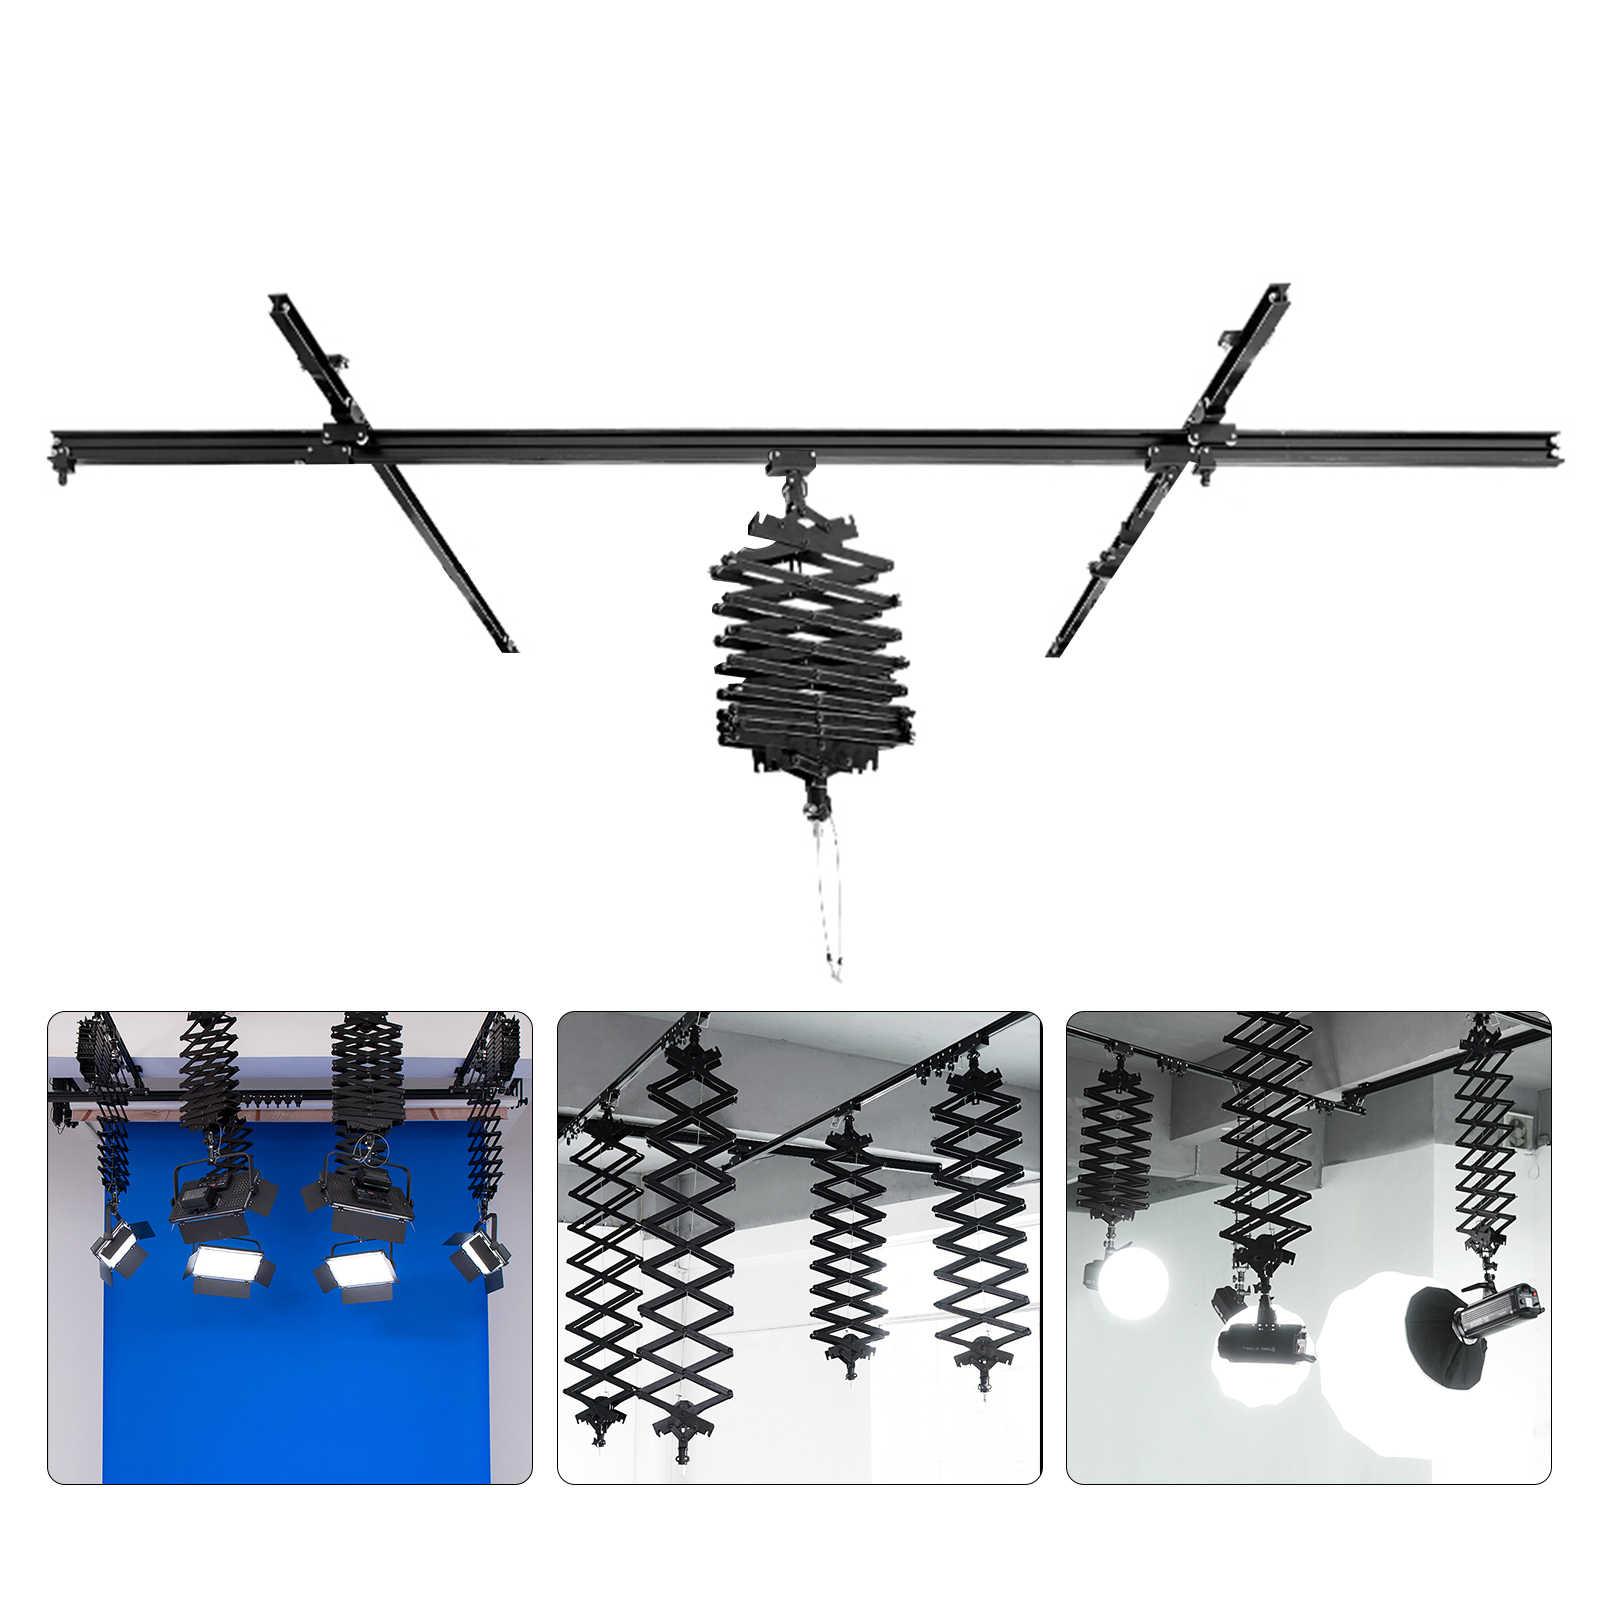 6x Pantograph Replacement Cable Clips for Pantograph Ceiling Rail System Pantograph Accessories Studio Photography Photo Video Spotlight